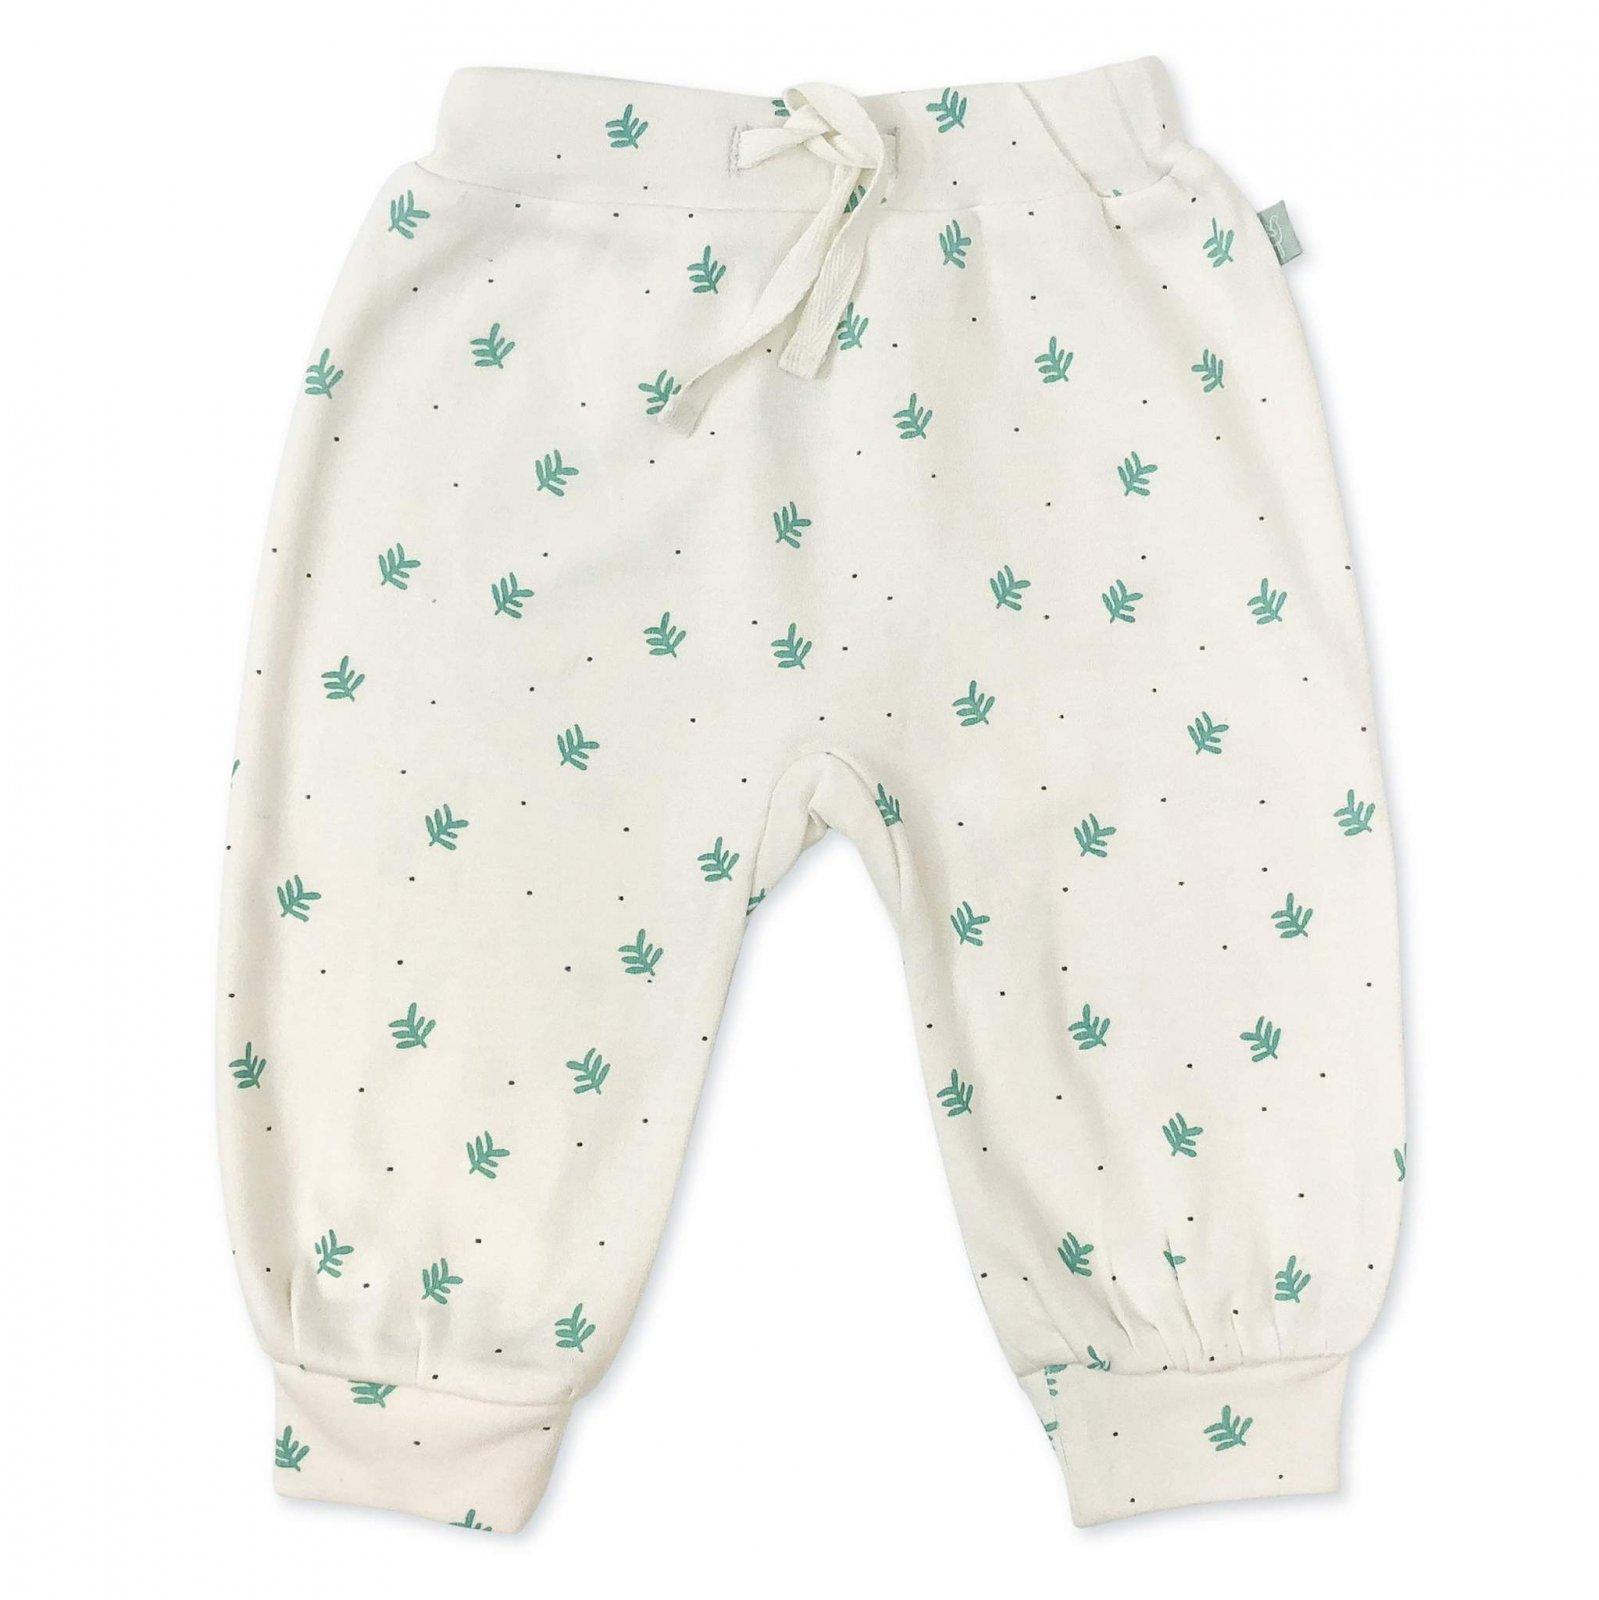 Finn + Emma Harem Pants